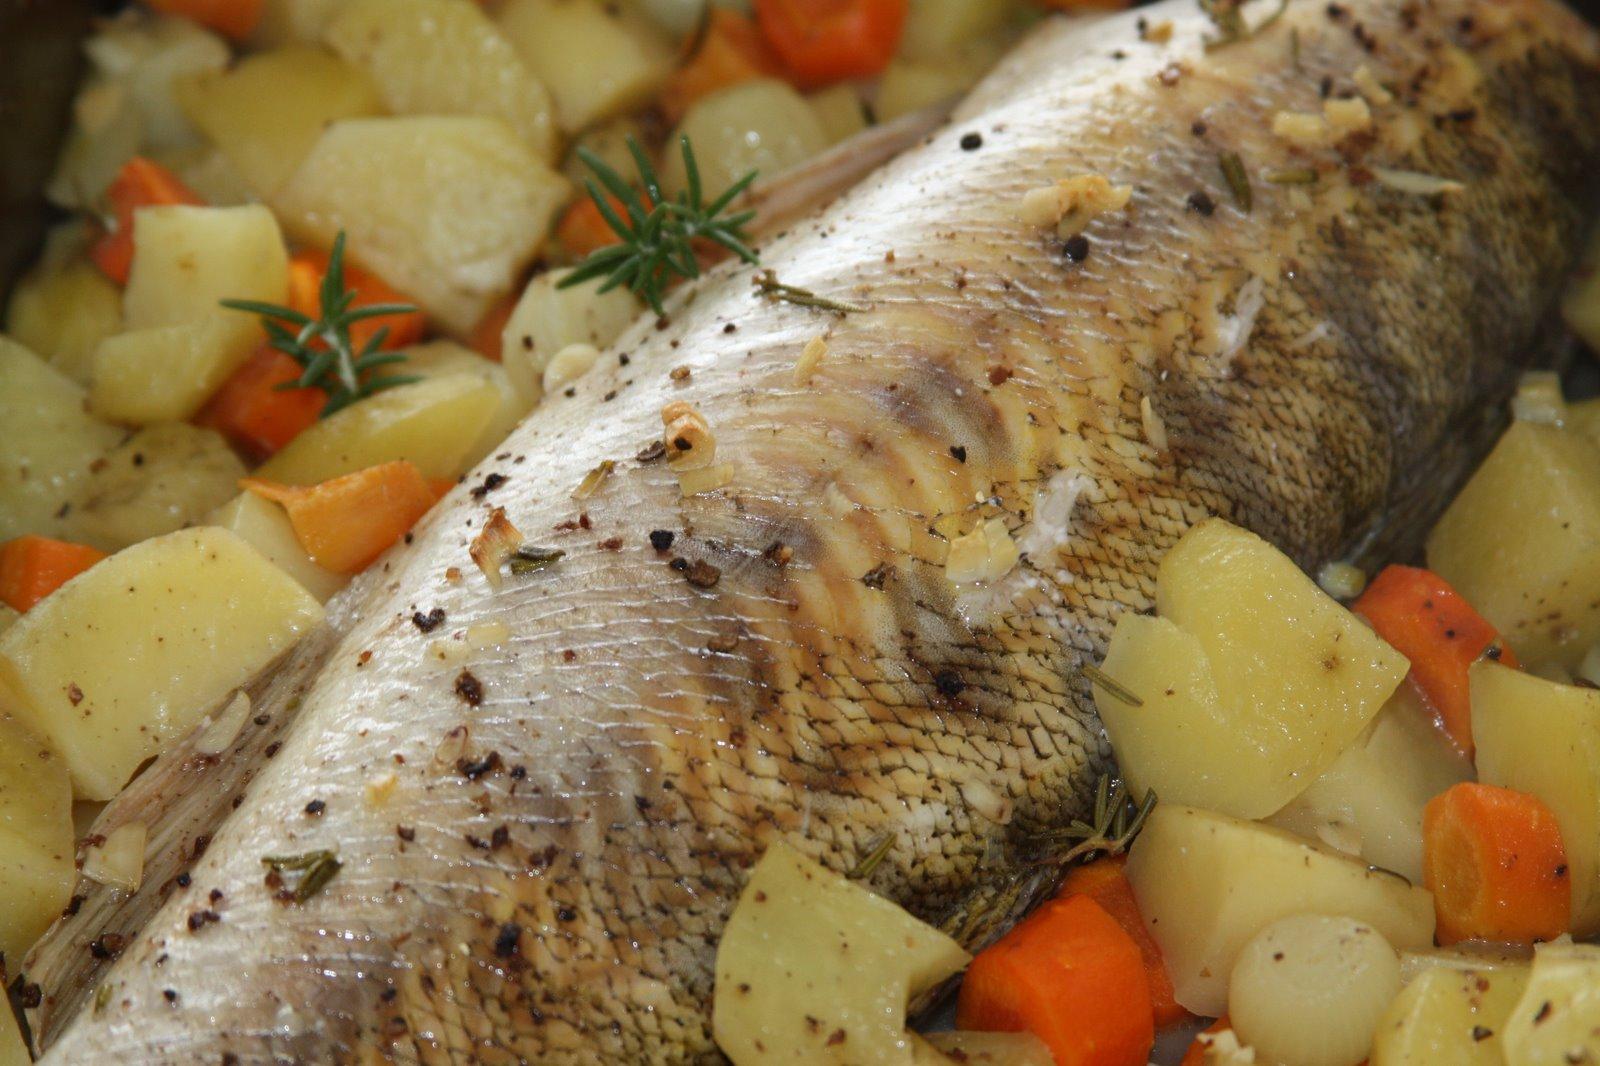 žuvis su daržovėmis folijoje